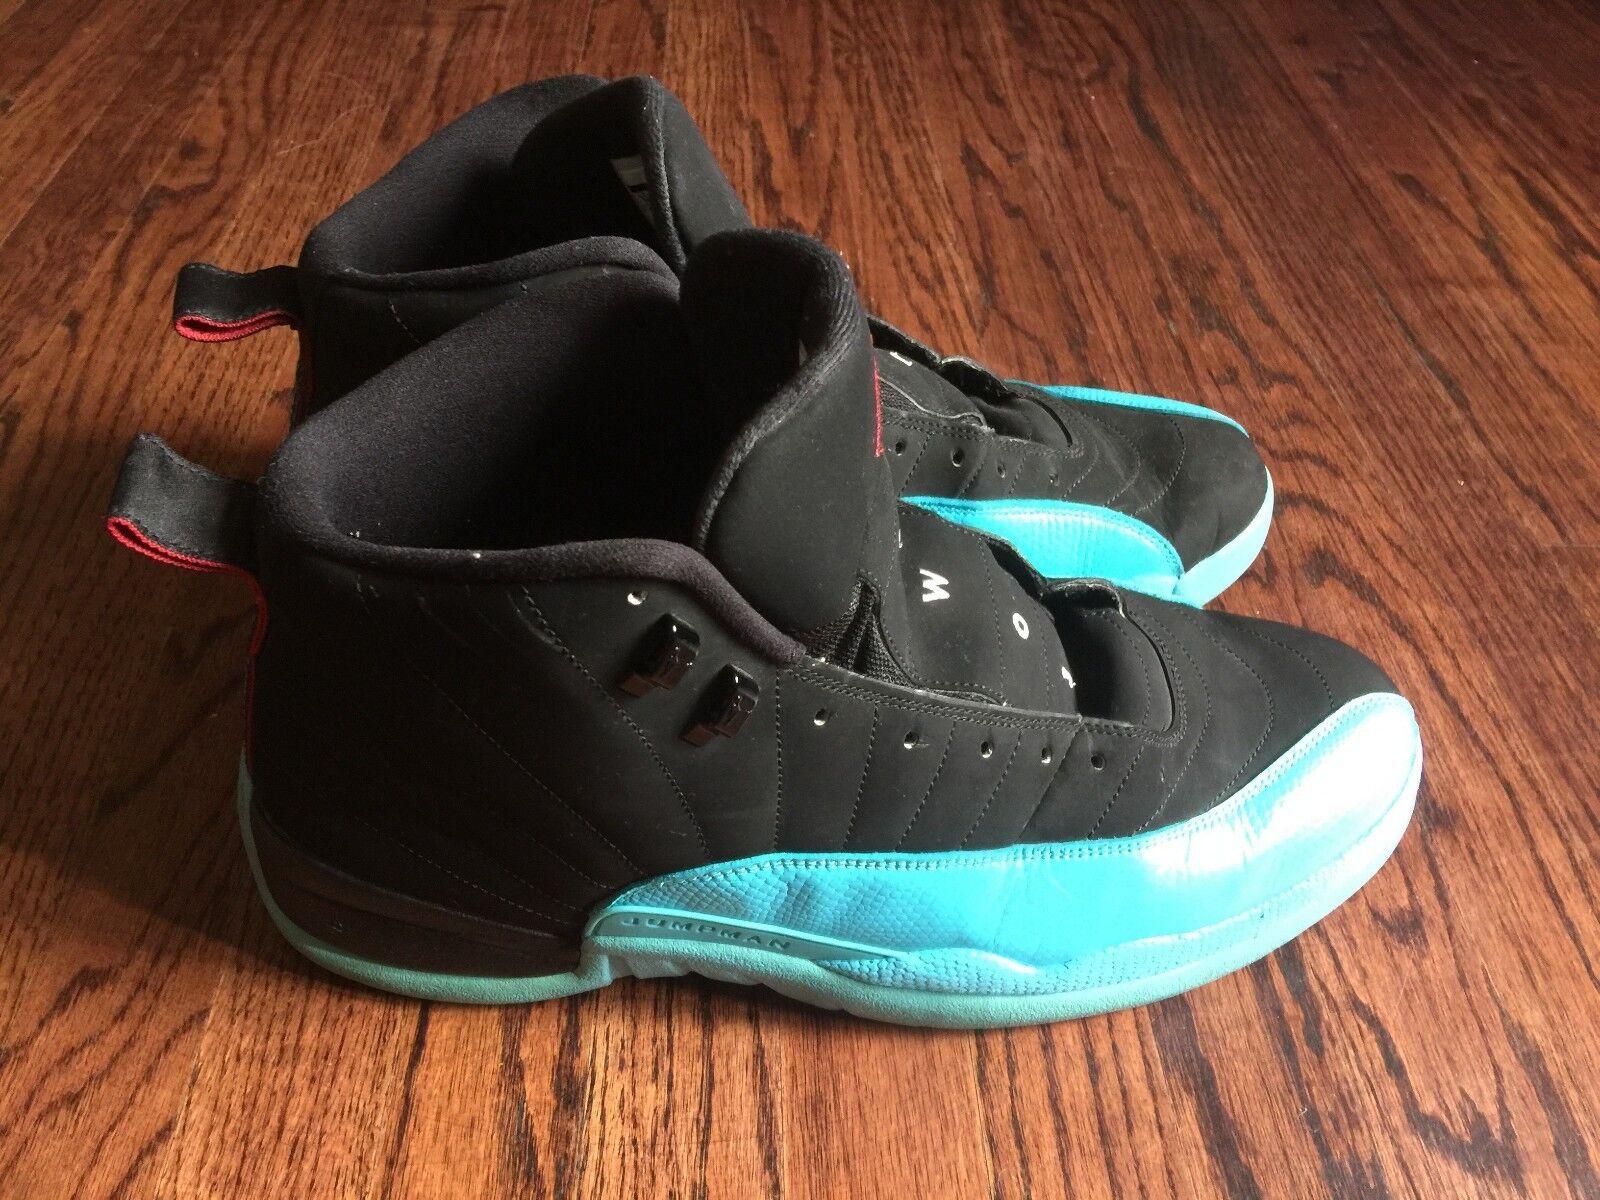 jordan 12 retro gamma blue size 14 used